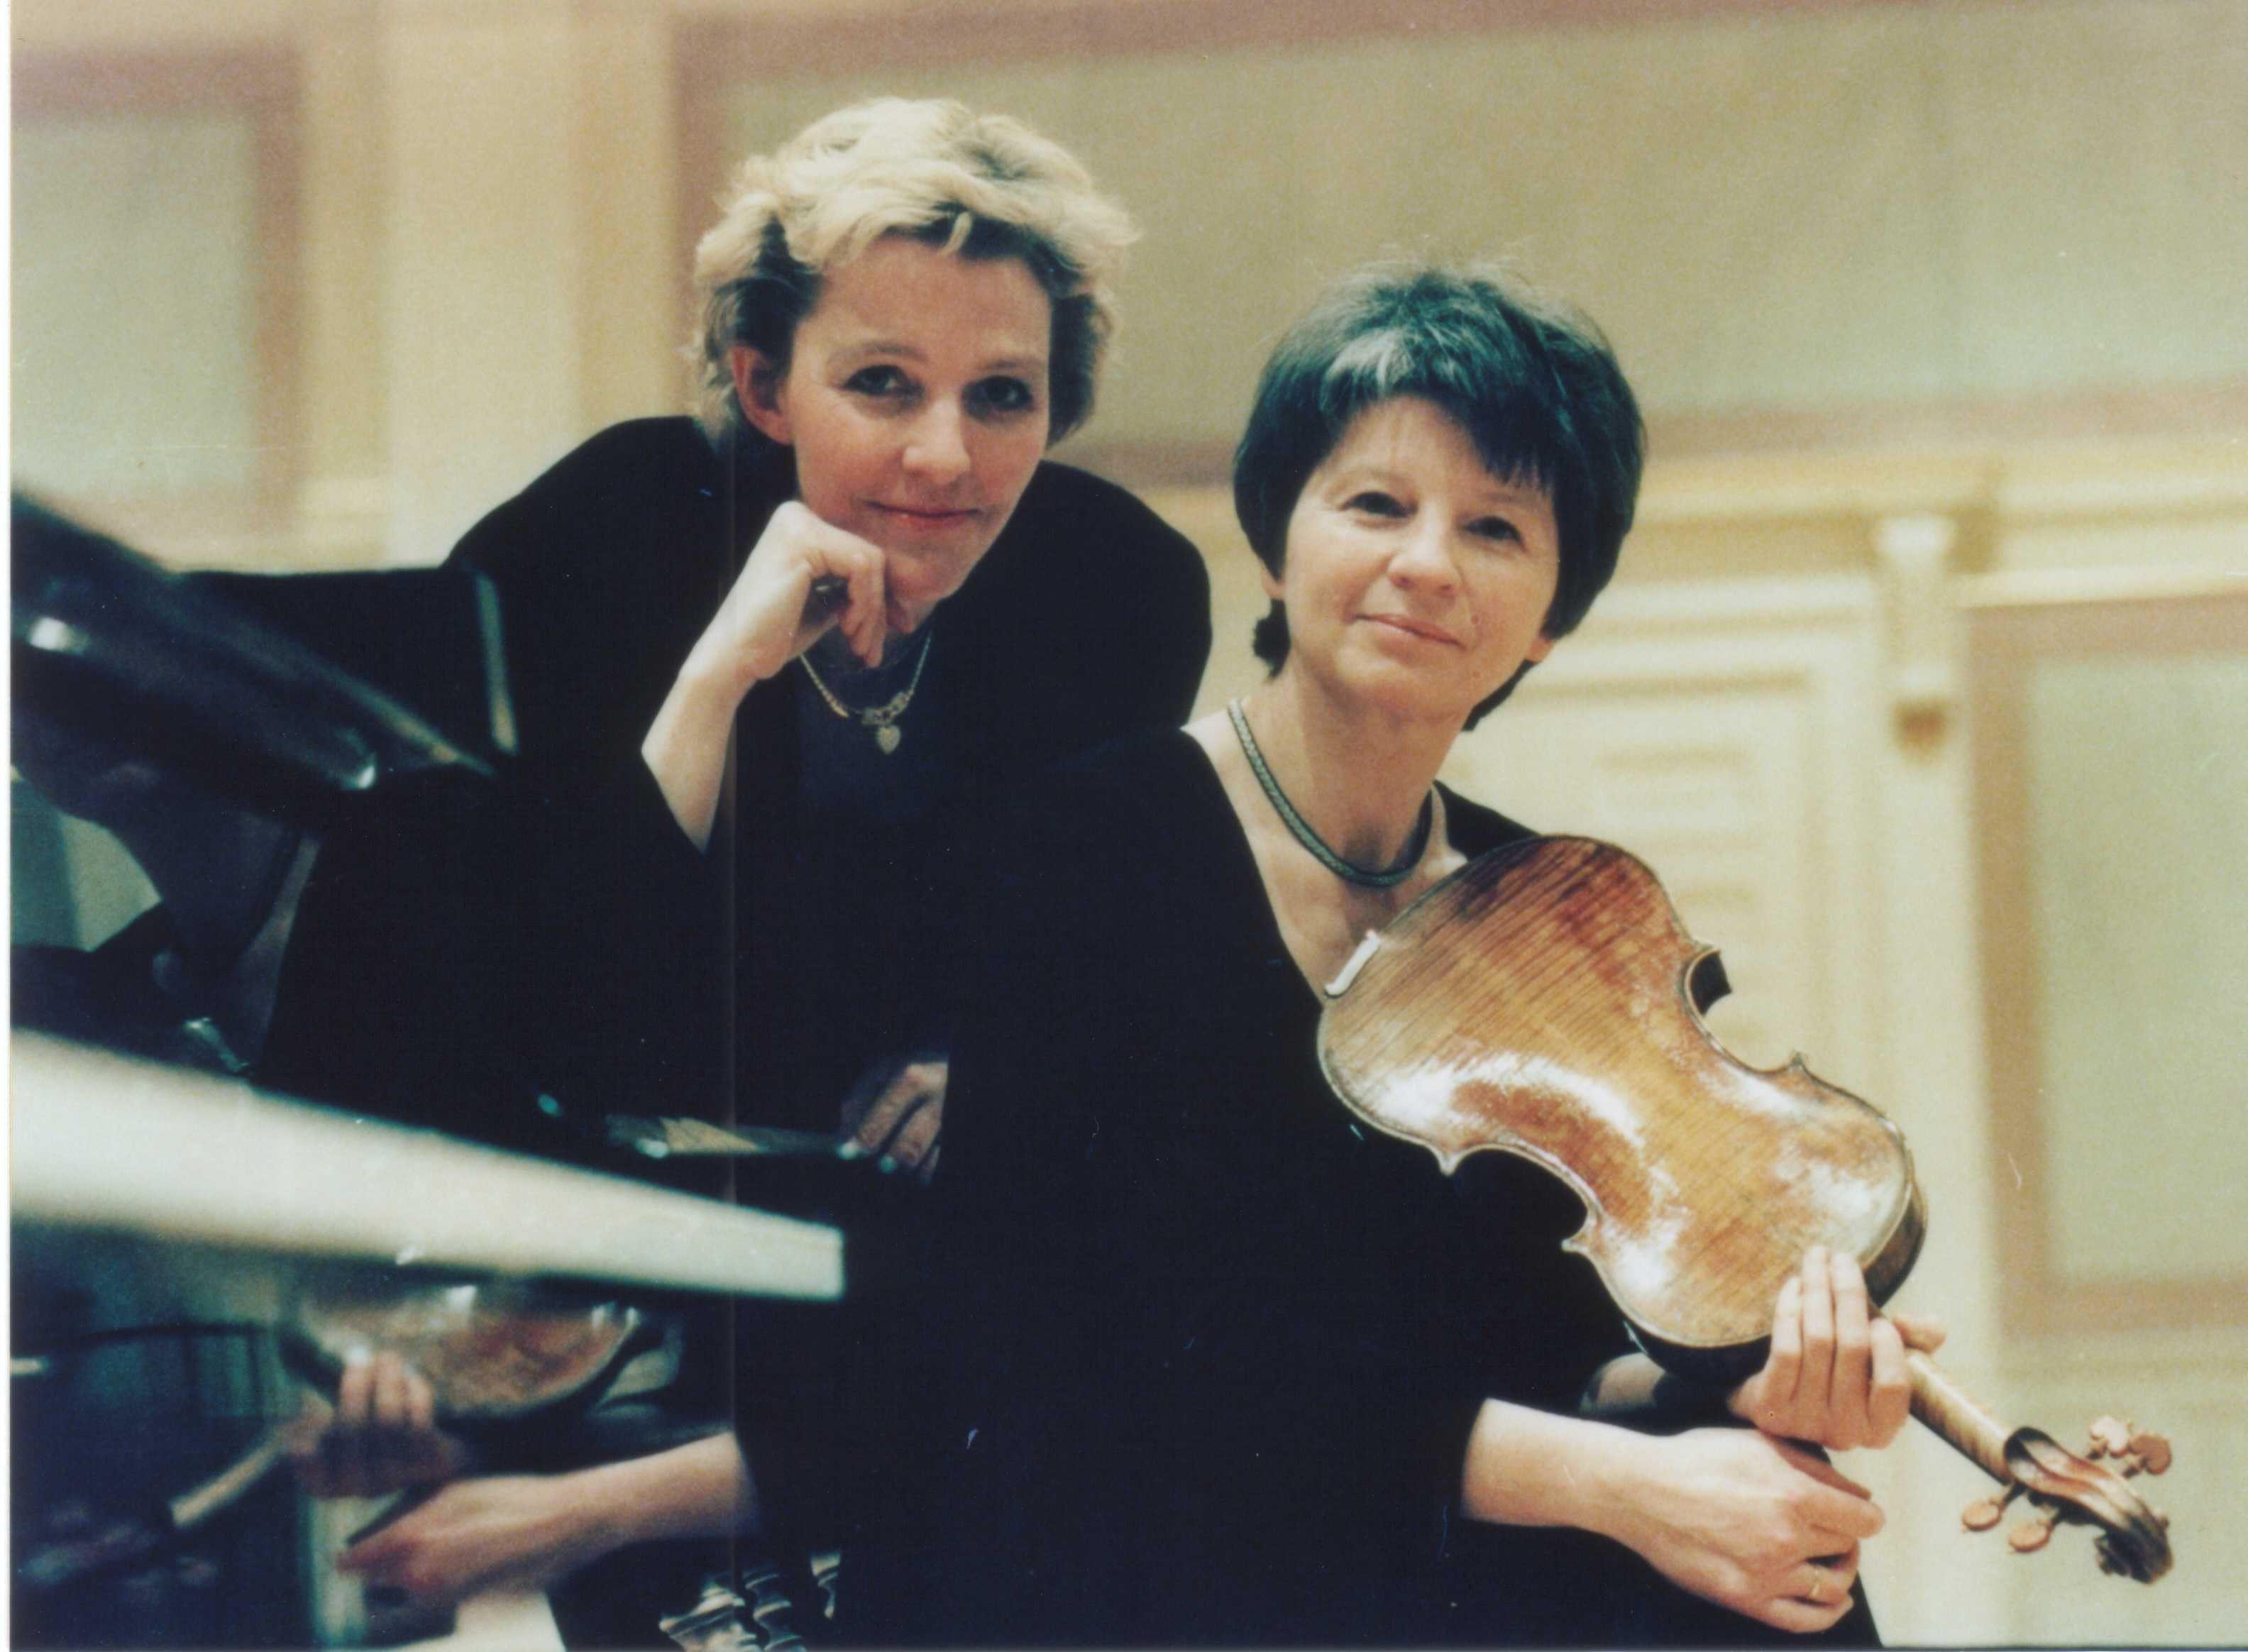 Concert: Wieska Szymczynska and Bénédicta Haid